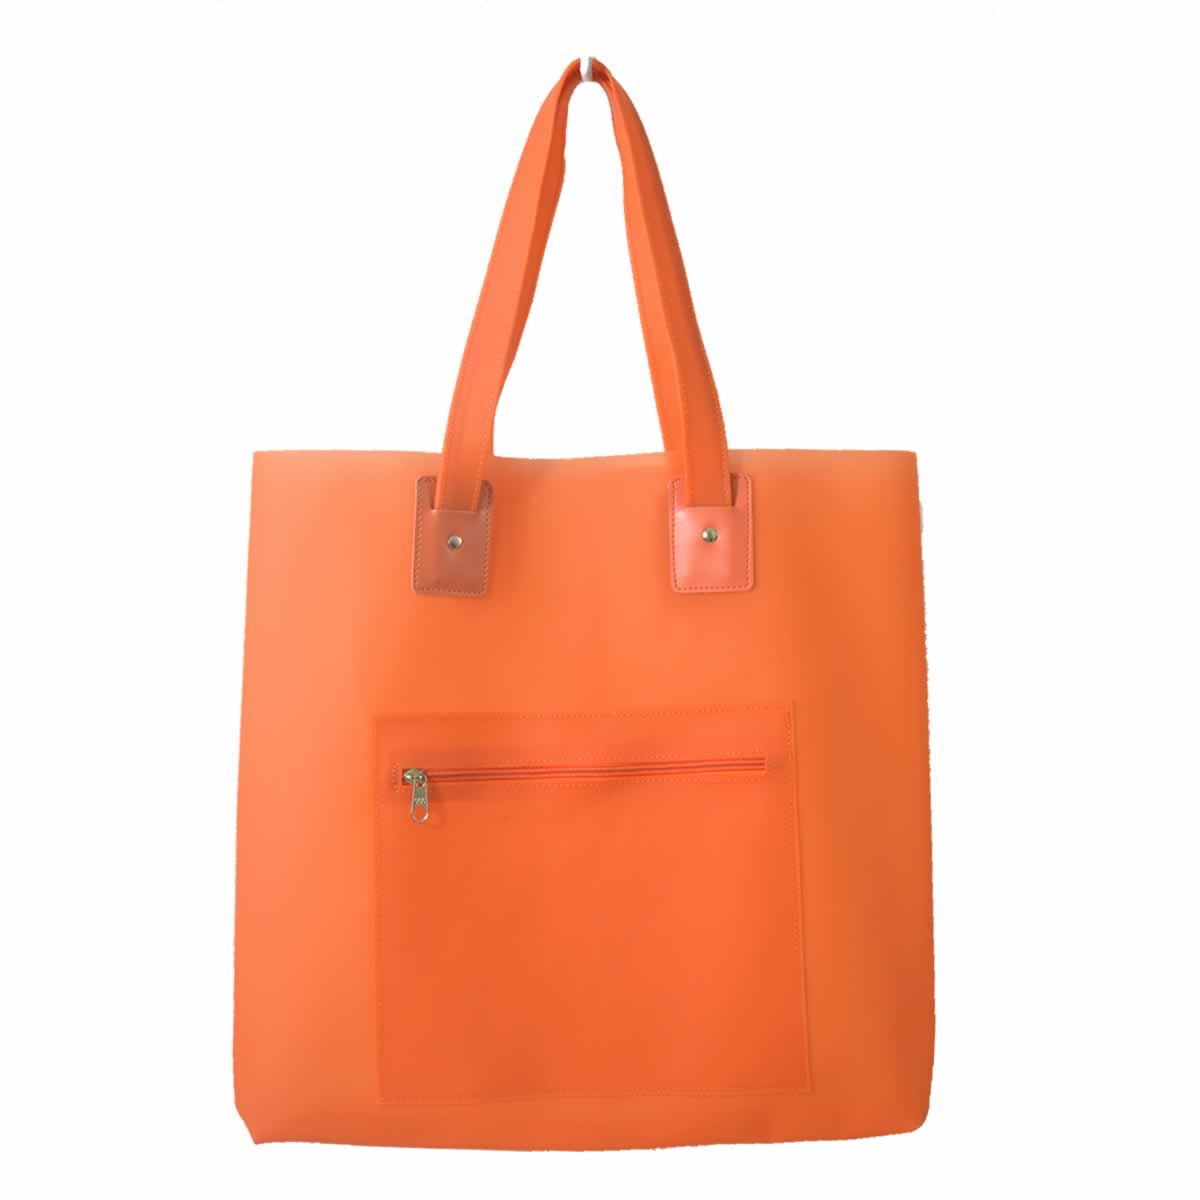 Bolsa de praia laranja com bolso zíper